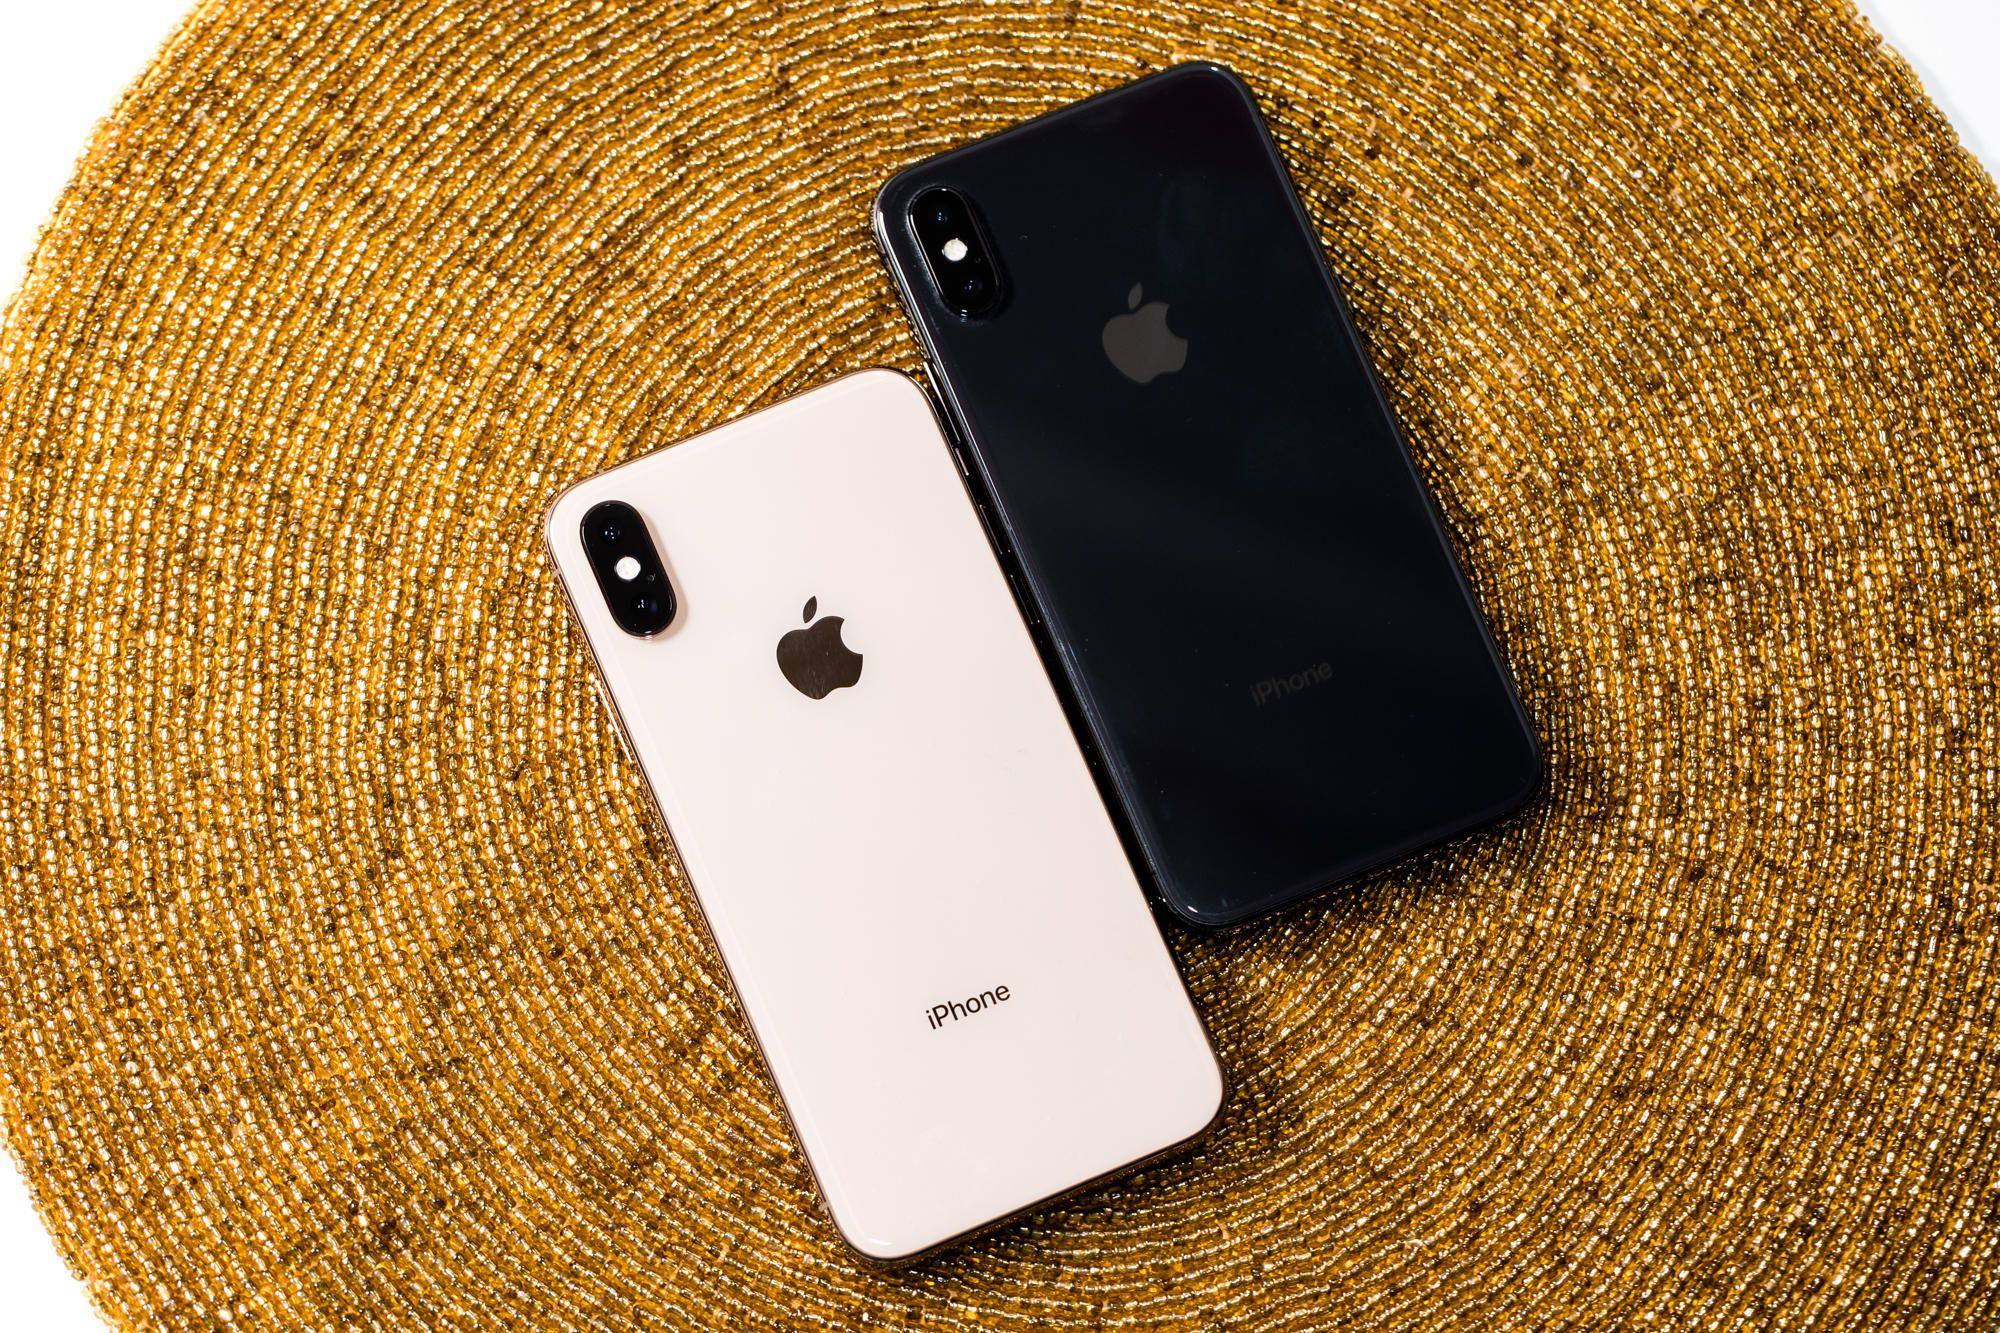 Отличия iPhone XS от X: как не переплатить за прошлогодний флагман - фото 1 | Сервисный центр Total Apple